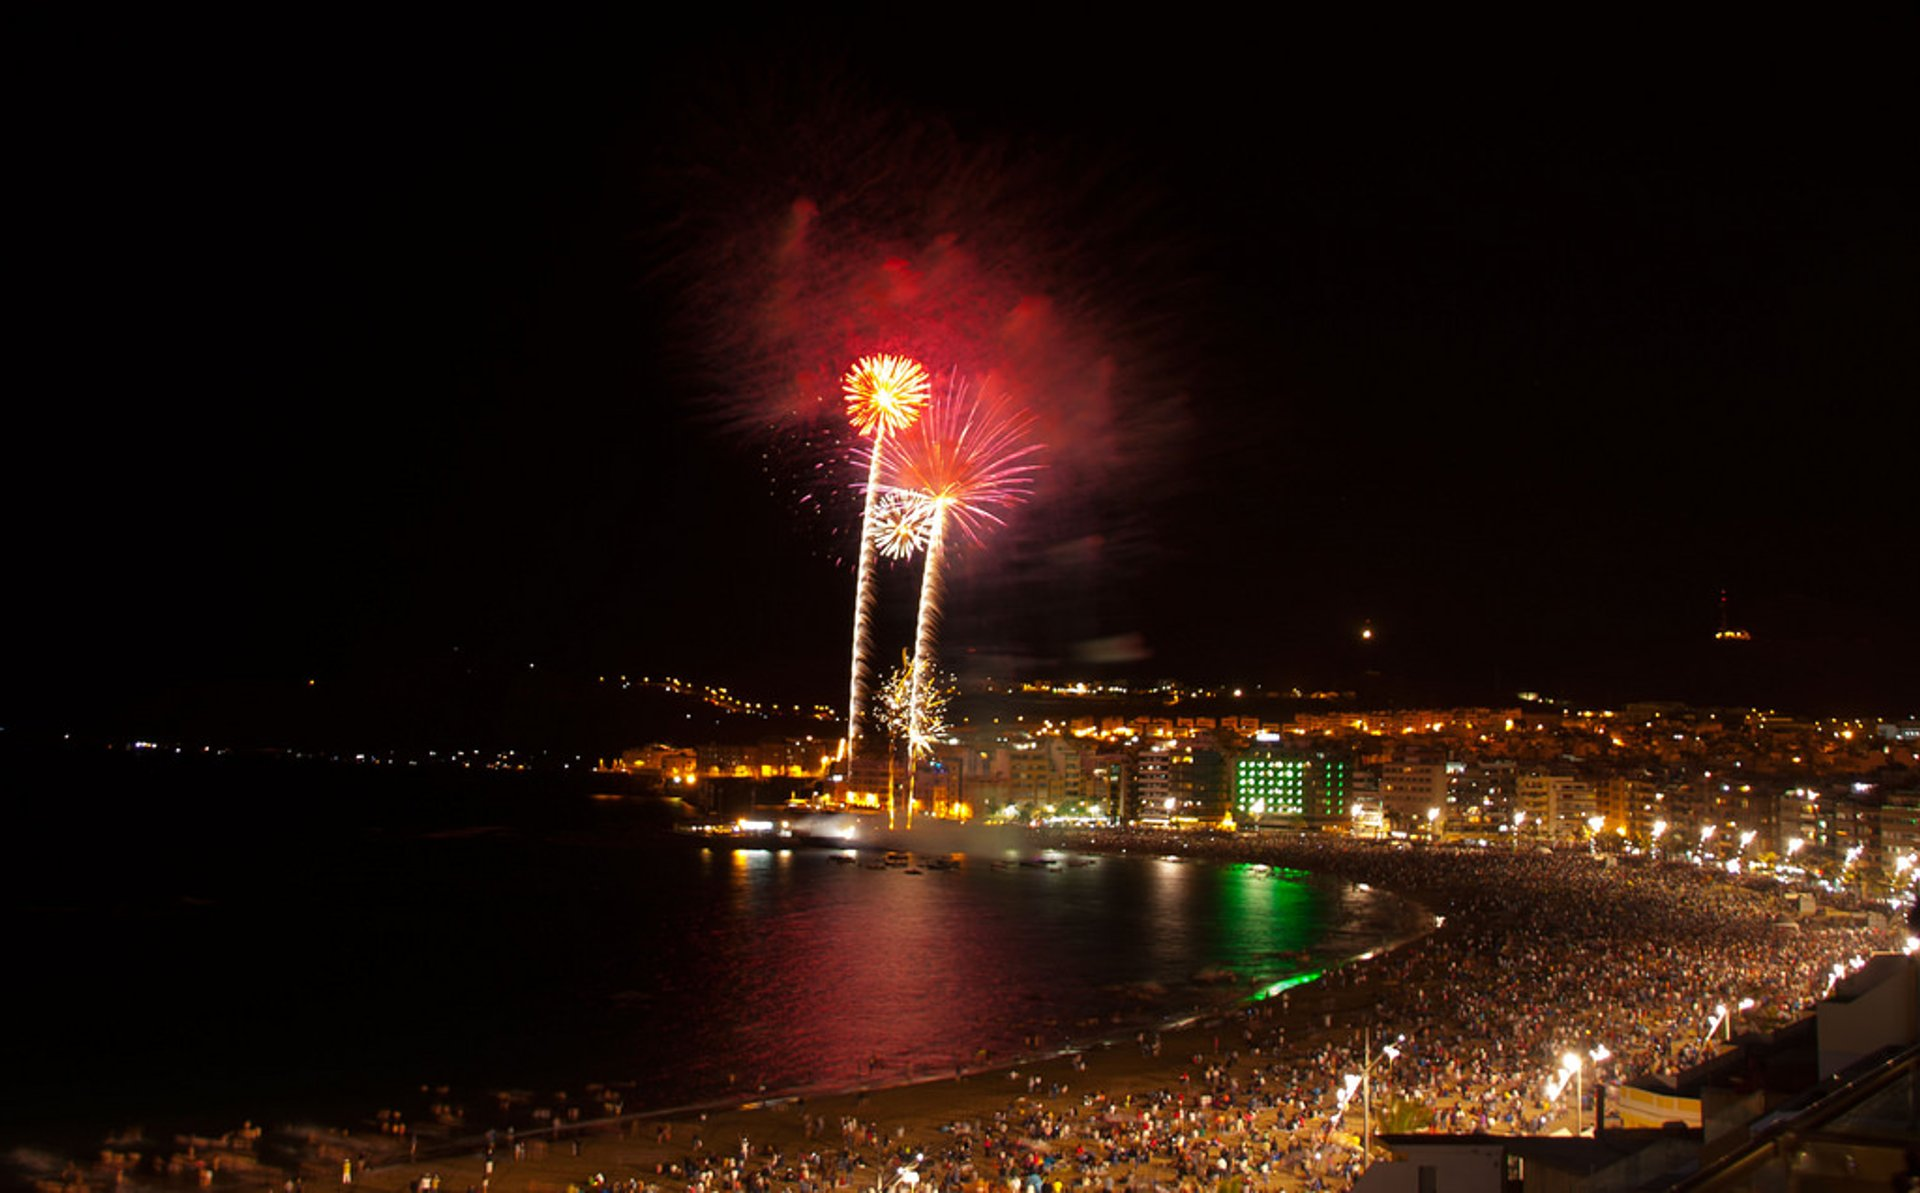 Best time for San Juan Bonfire Festival (Noche de San Juan) in Spain 2020